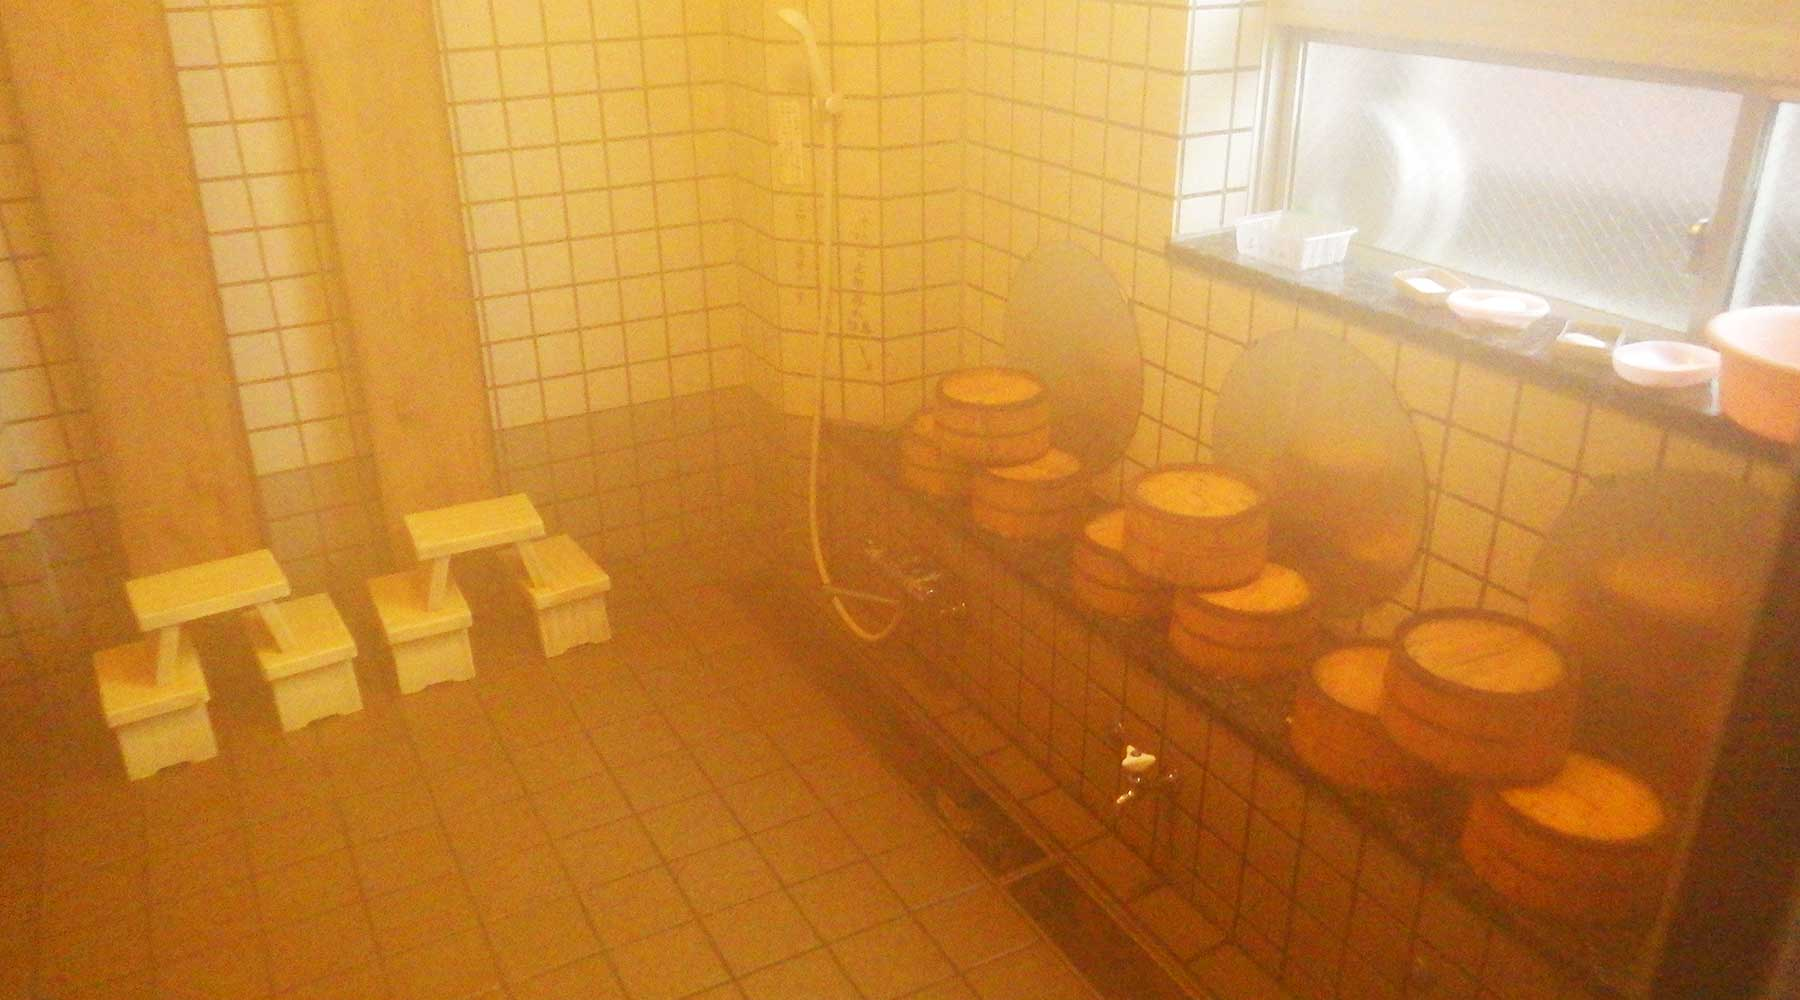 尾瀬温泉小屋の風呂